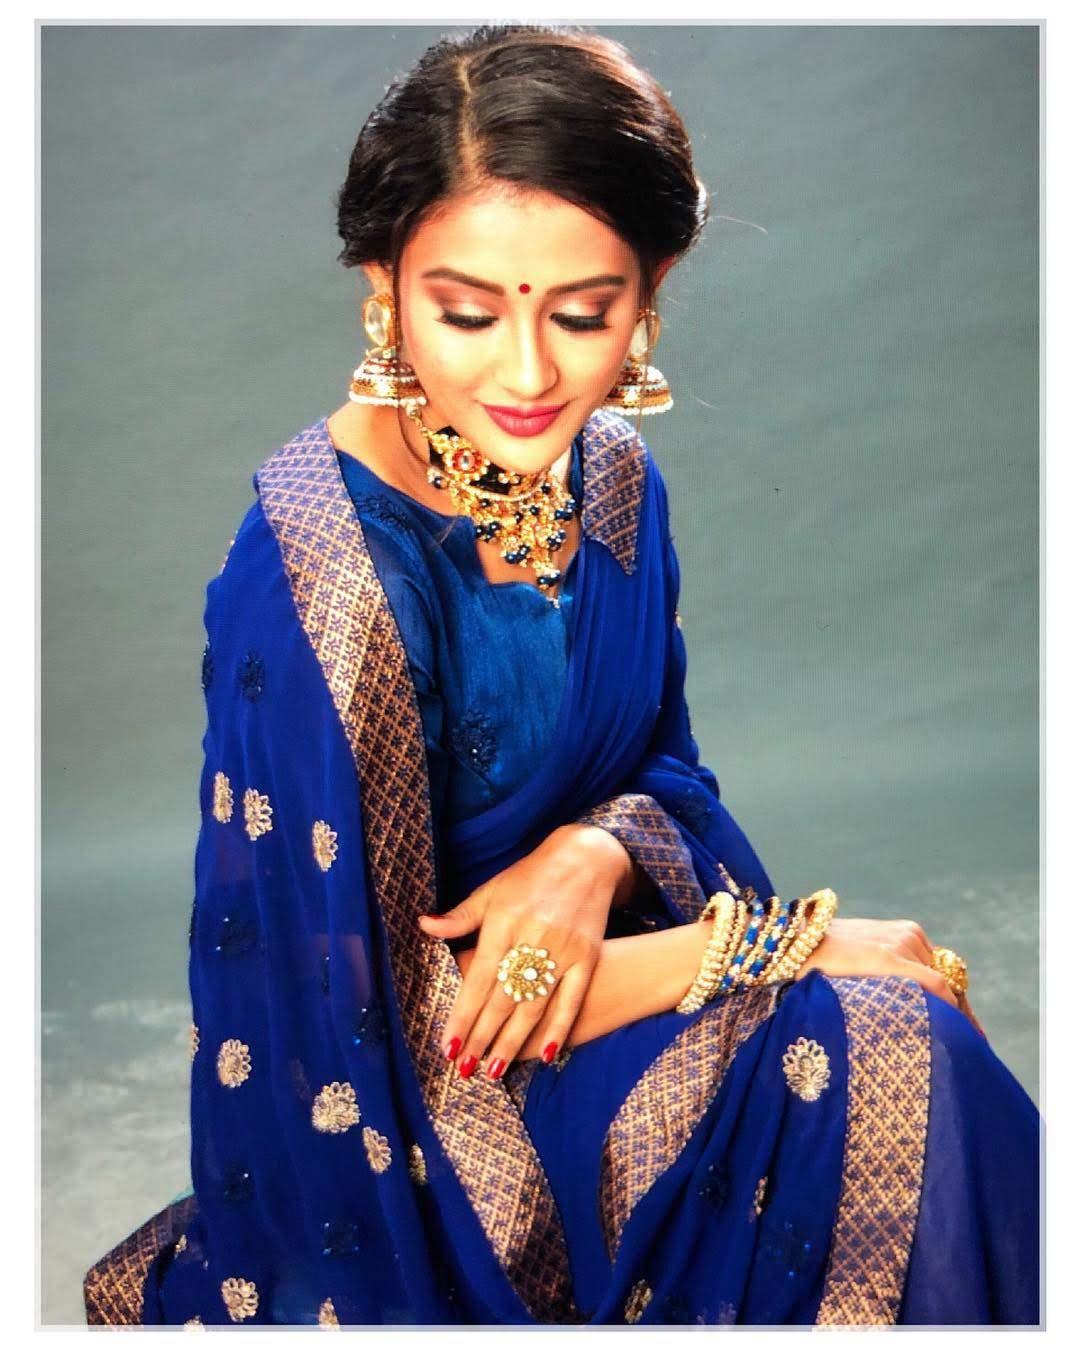 Pooja-Jhaveri-611728